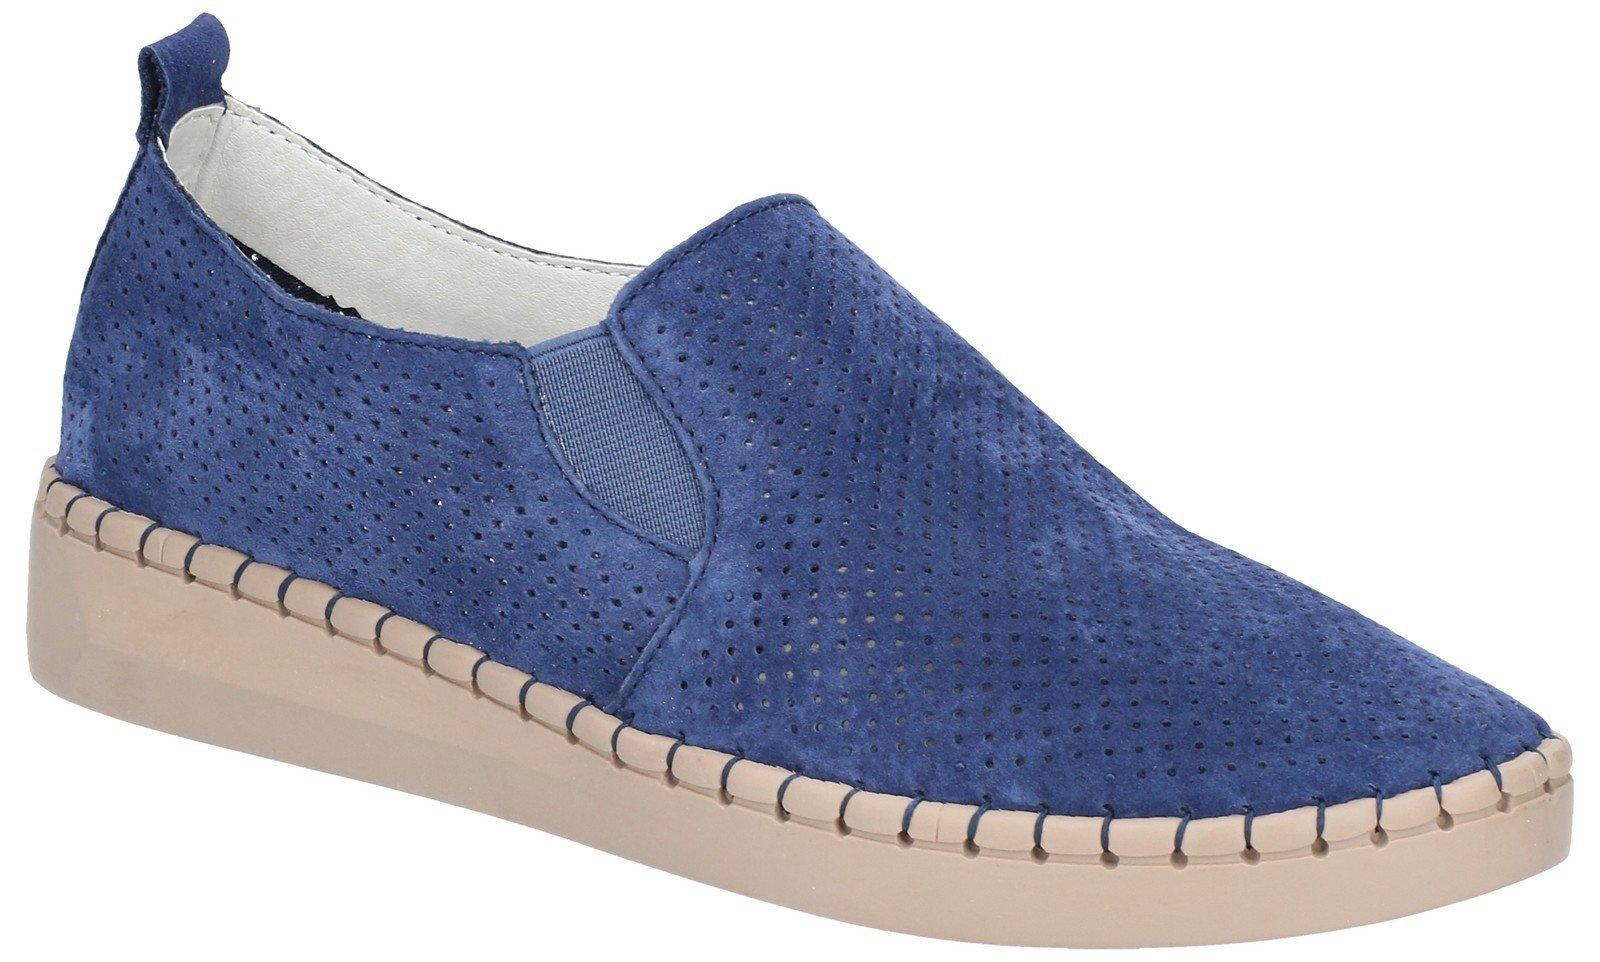 Fleet & Foster Women's Tulip Slip On Shoe Blue 28262-47470 - Navy 3